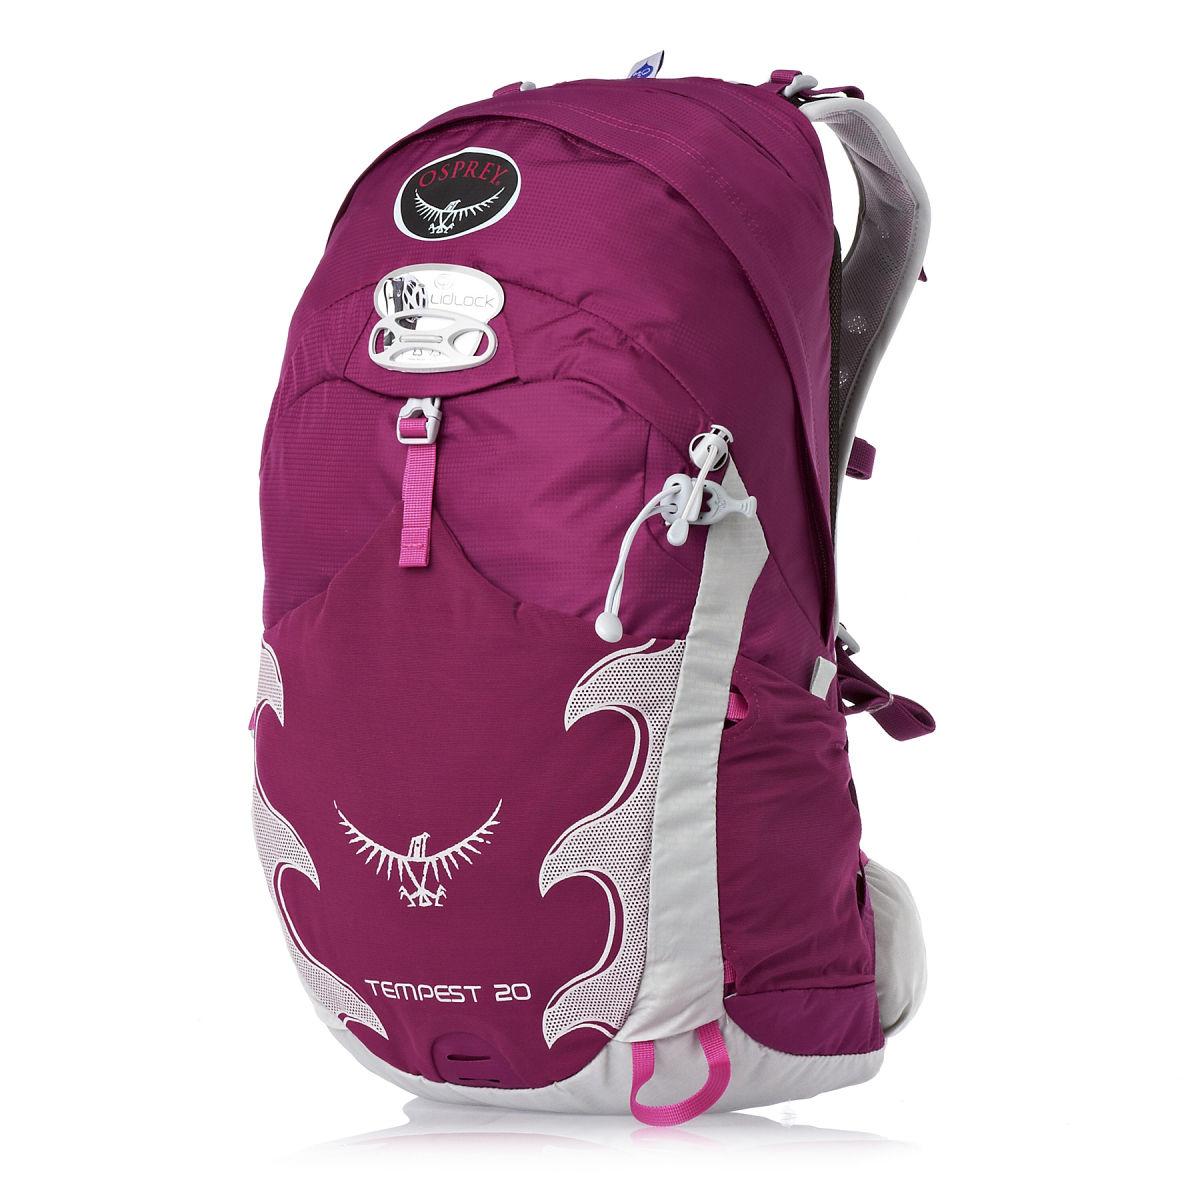 20L daypack - Osprey